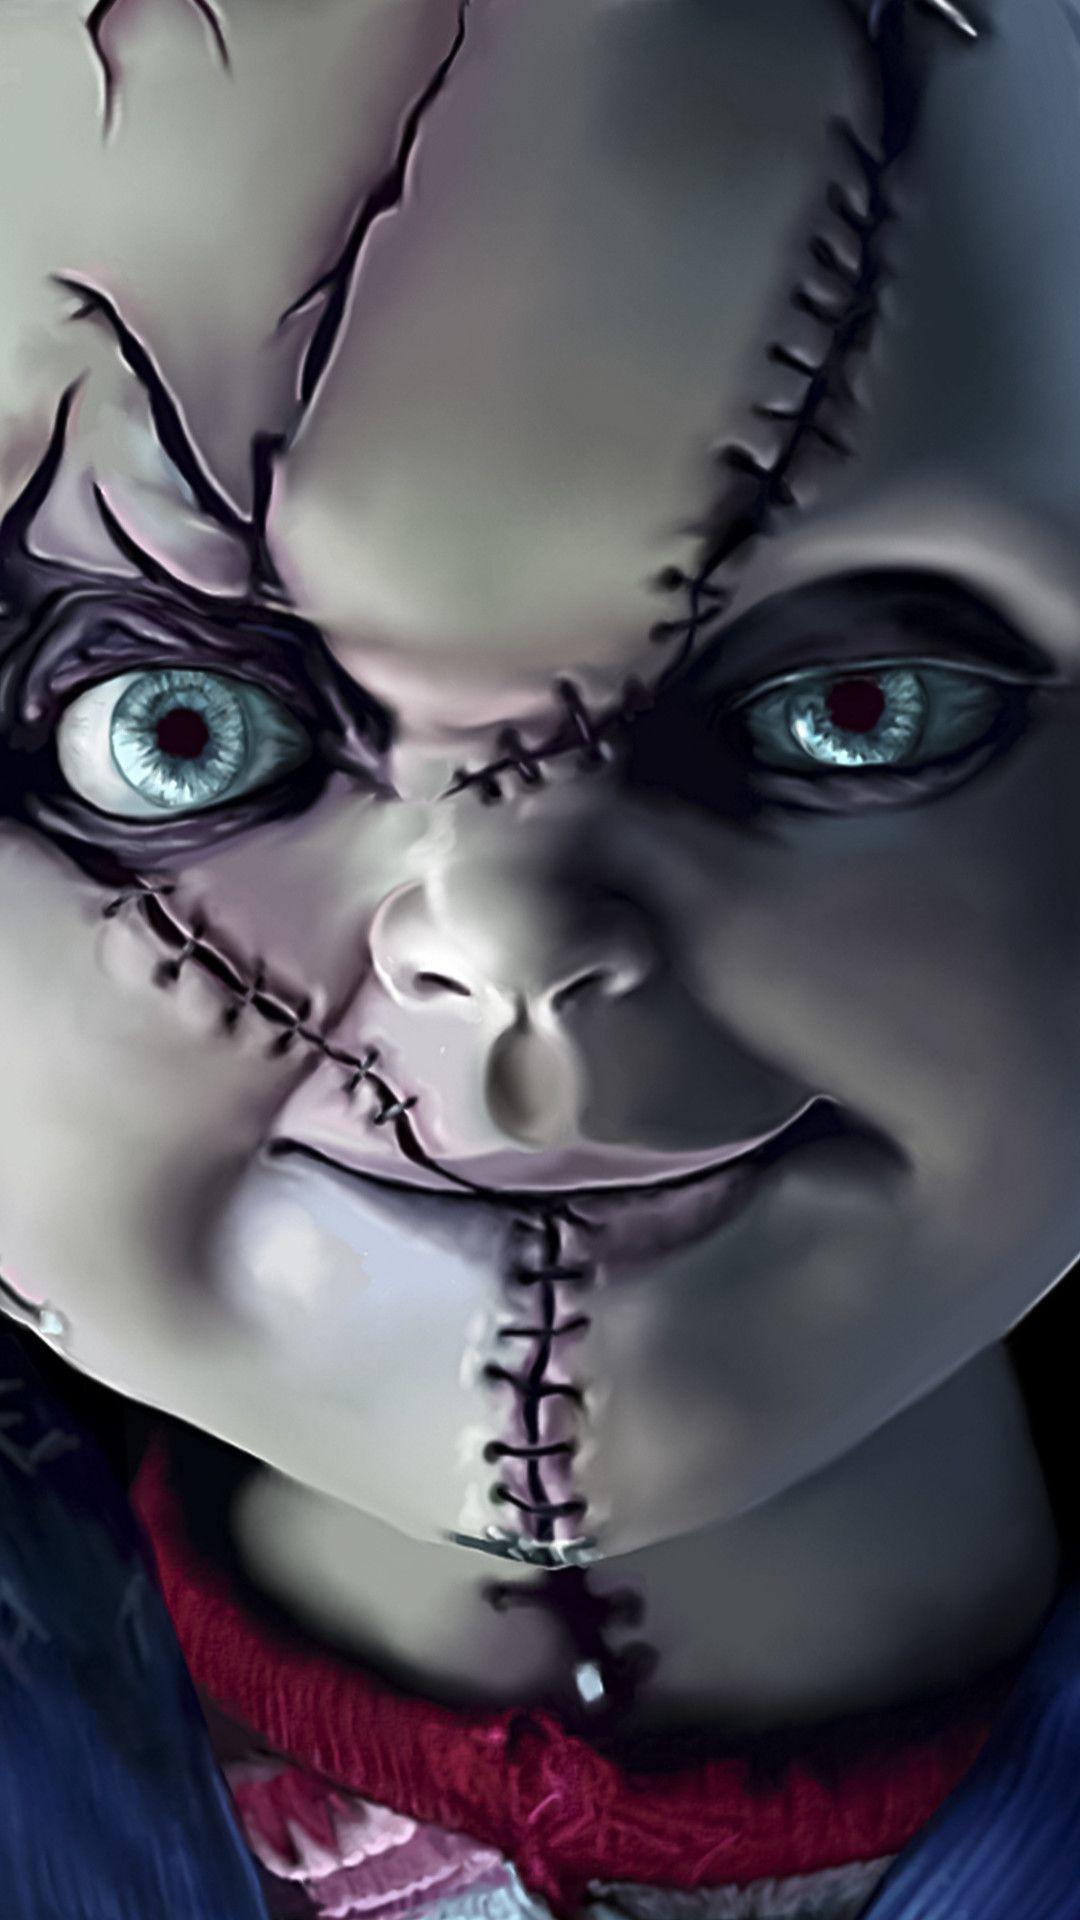 Horror 4K iPhone Wallpapers - Top Free Horror 4K iPhone ...